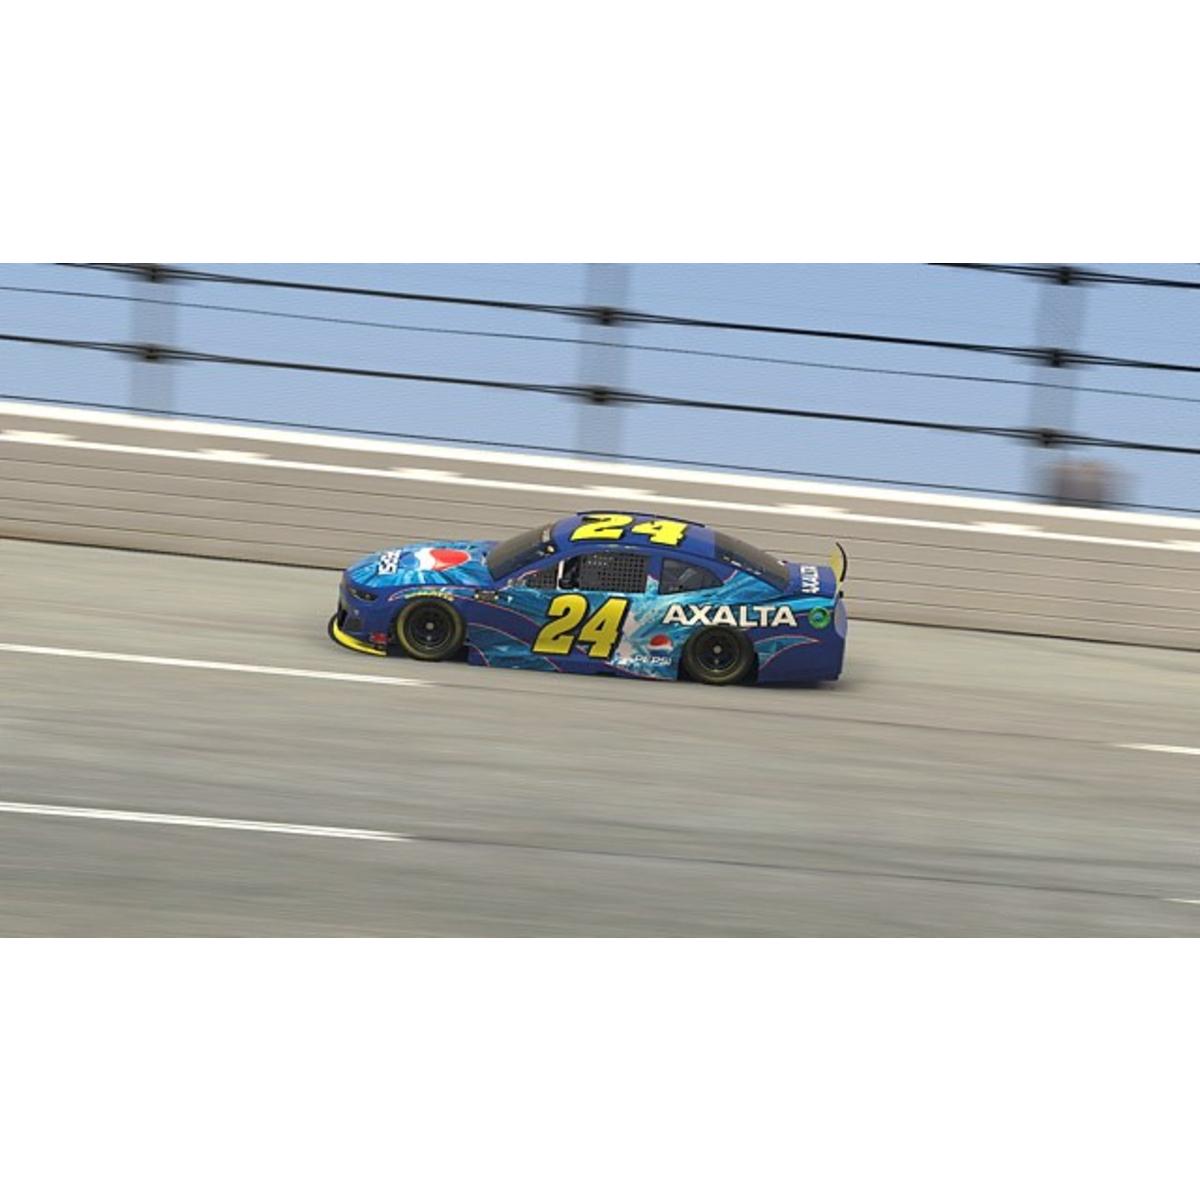 Autographed Jeff Gordon 2020 Pepsi Axalta Throwback iRacing Talladega #24 ELITE 1:24 Scale Die Cast